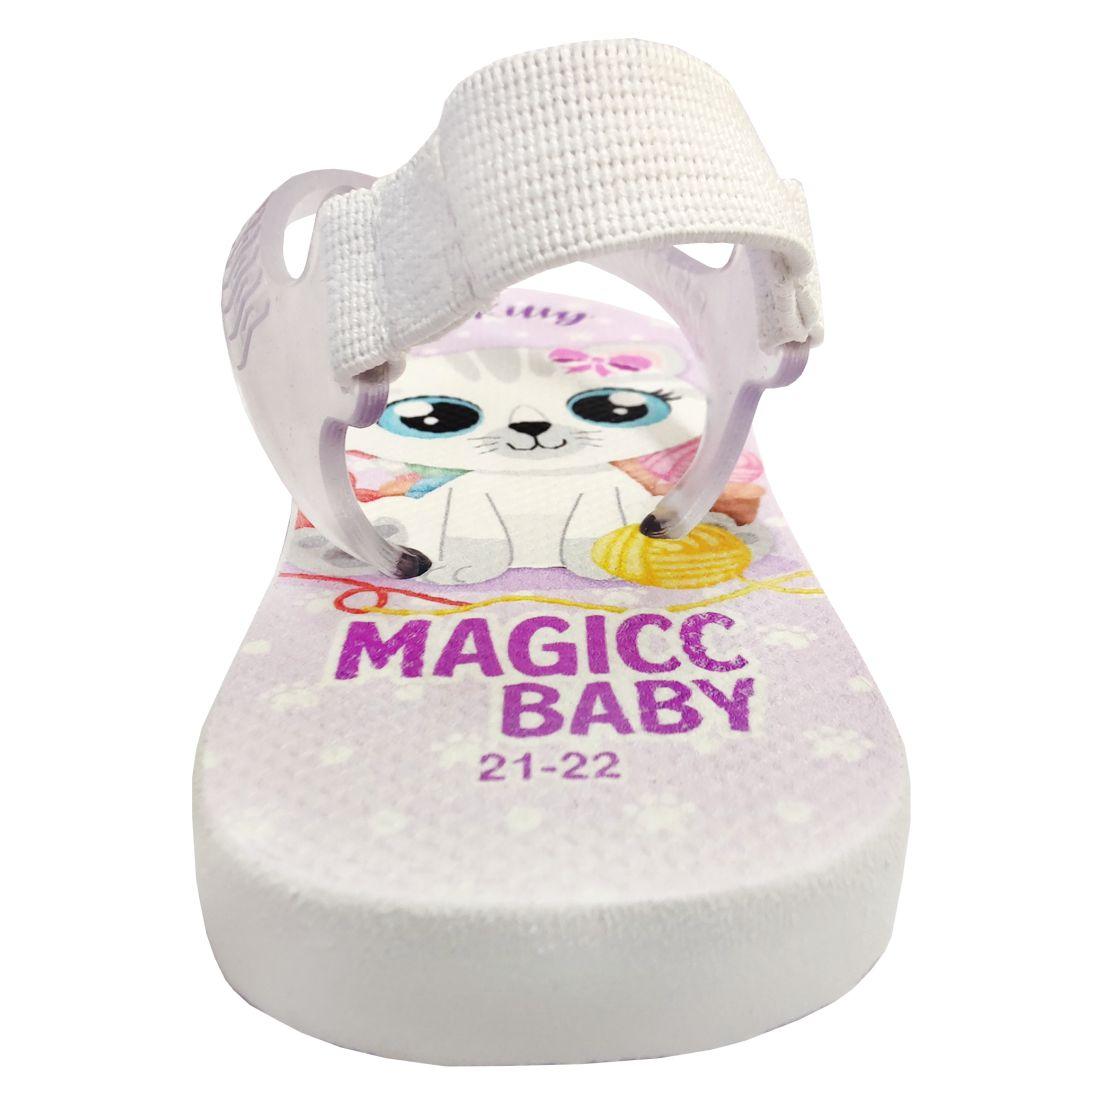 Chinelo Menina Bebê Sandália Gatinha Charmosa Magicc Baby